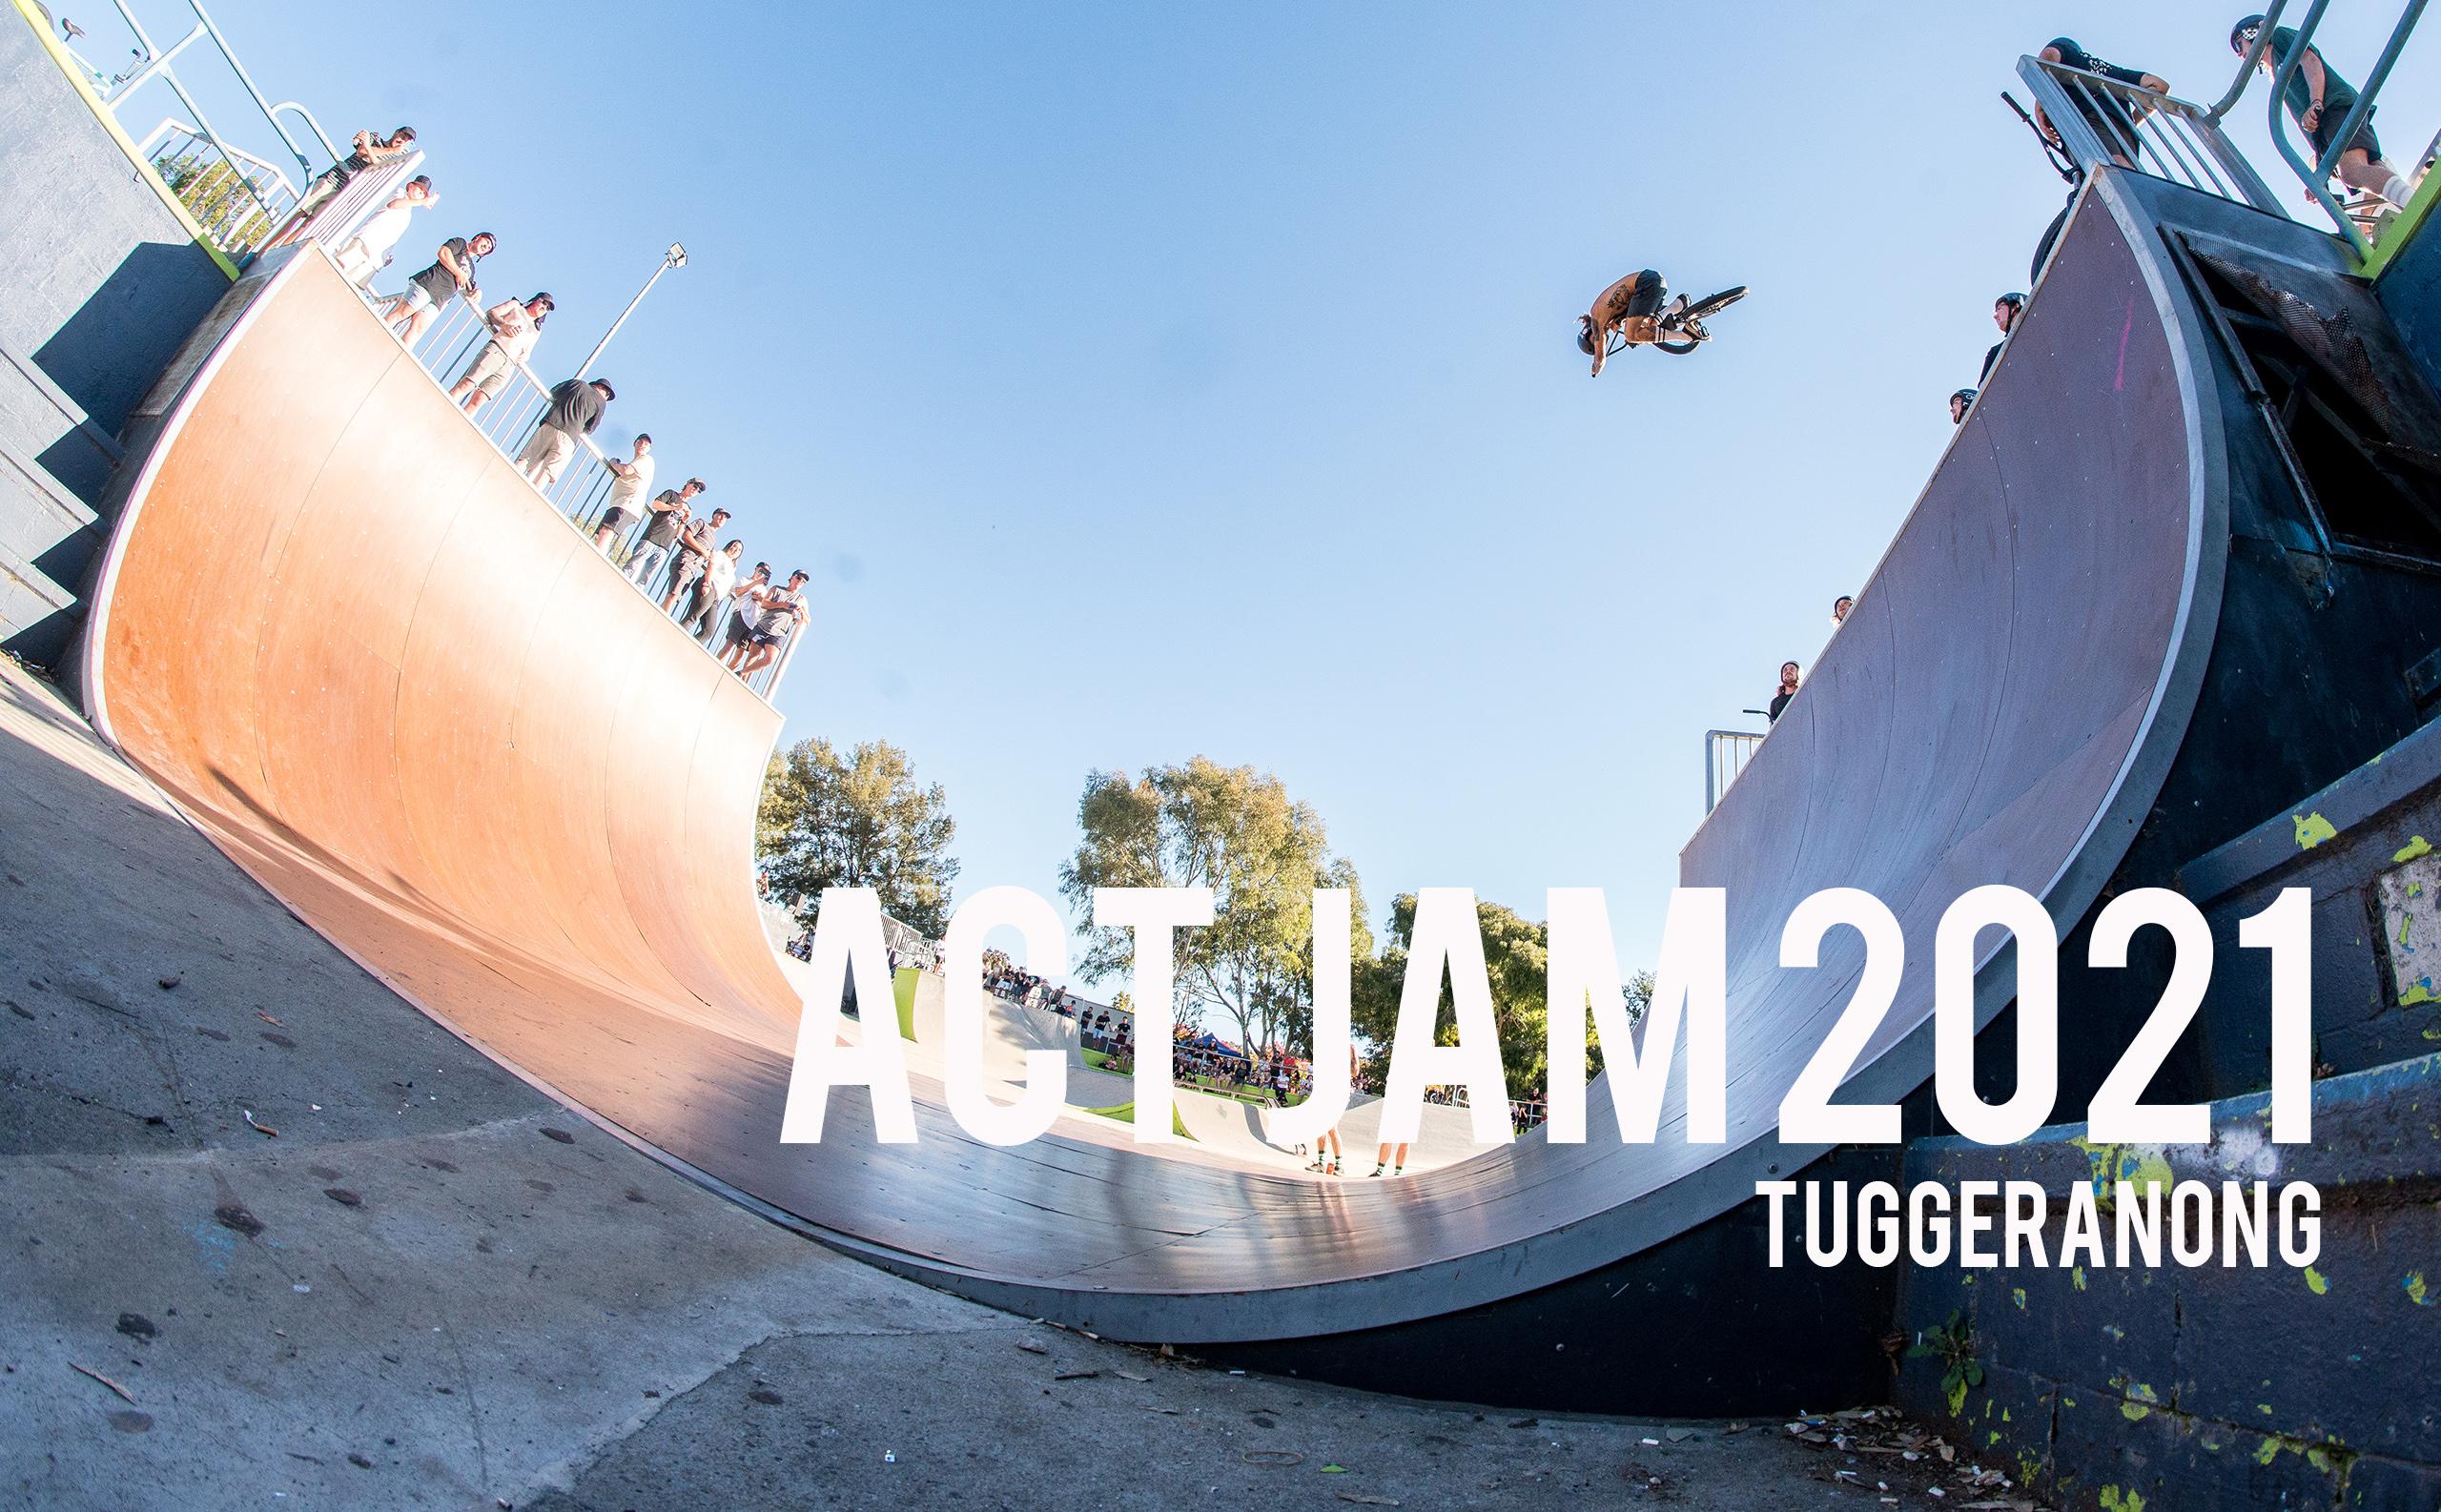 ACT JAM 2021 TUGGERANONG